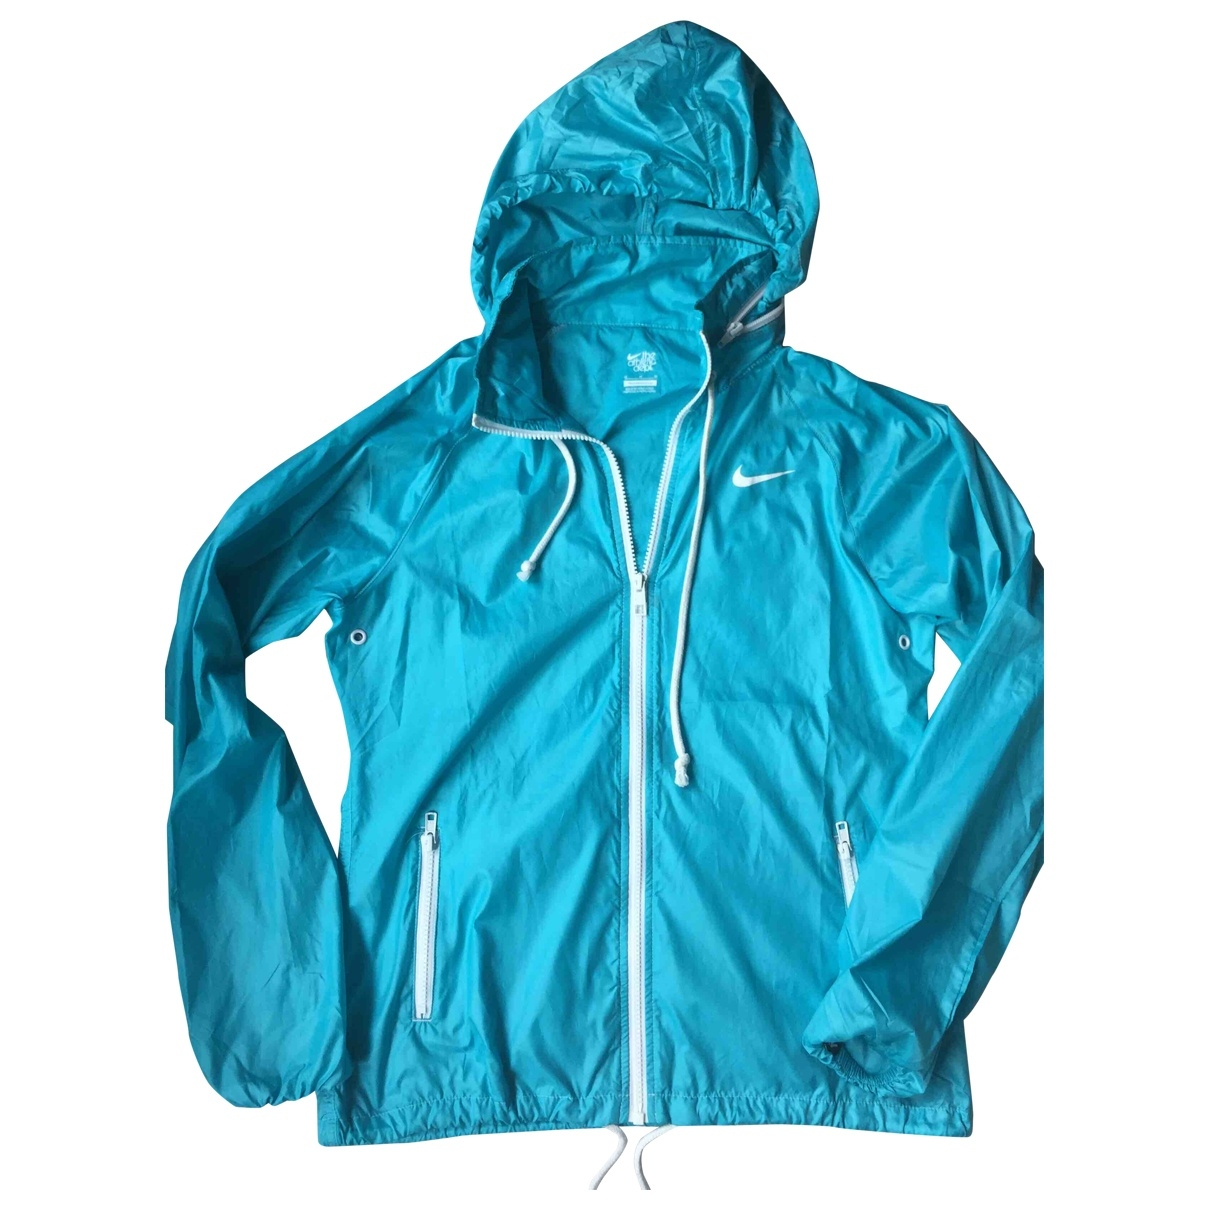 Nike \N Turquoise jacket for Women S International